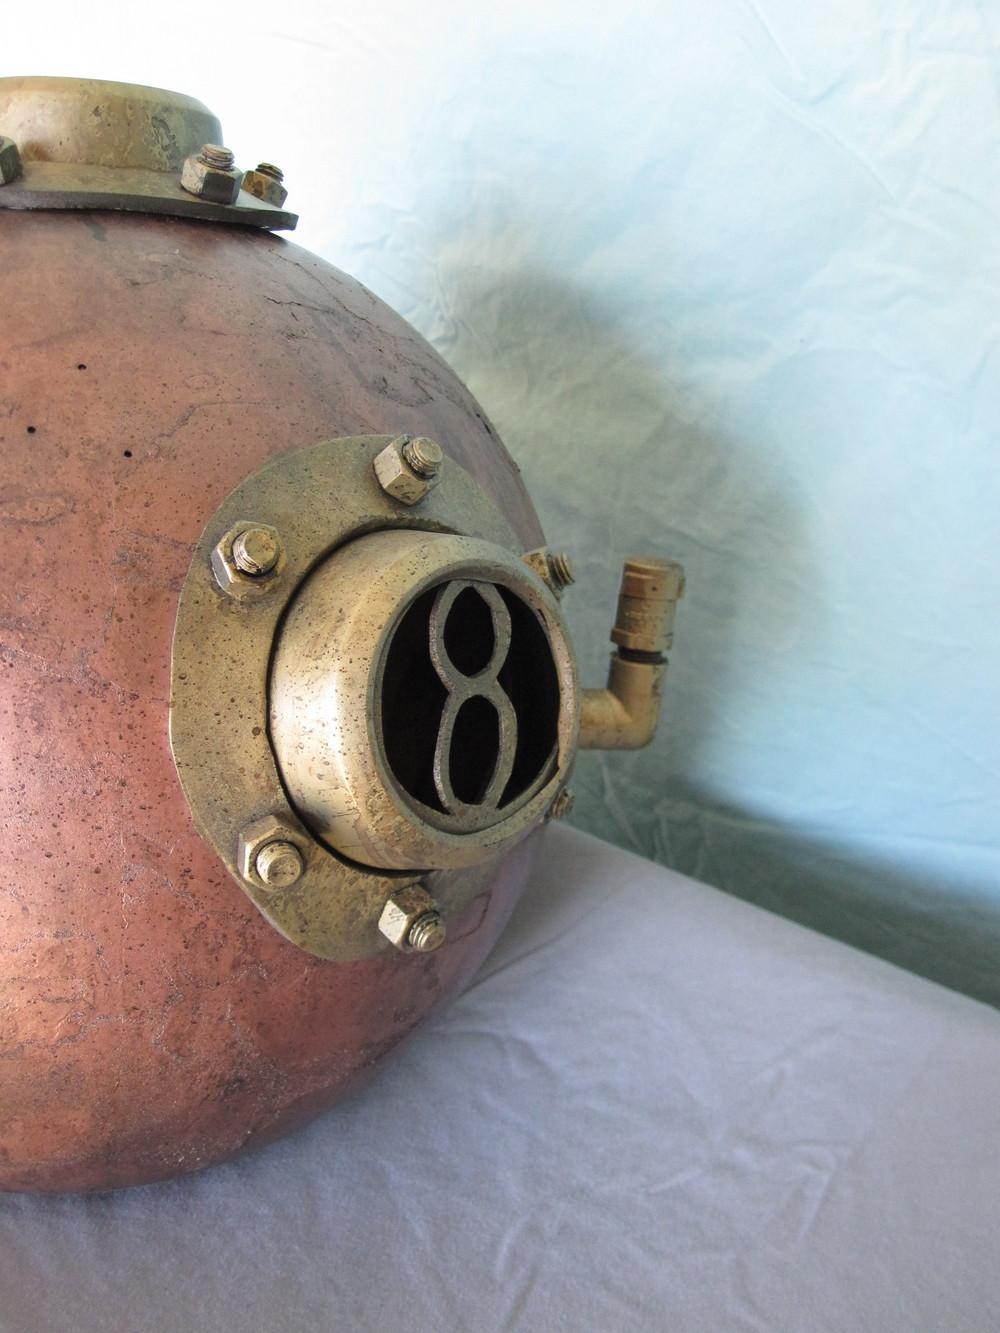 Diver Helmet Image 10.JPG